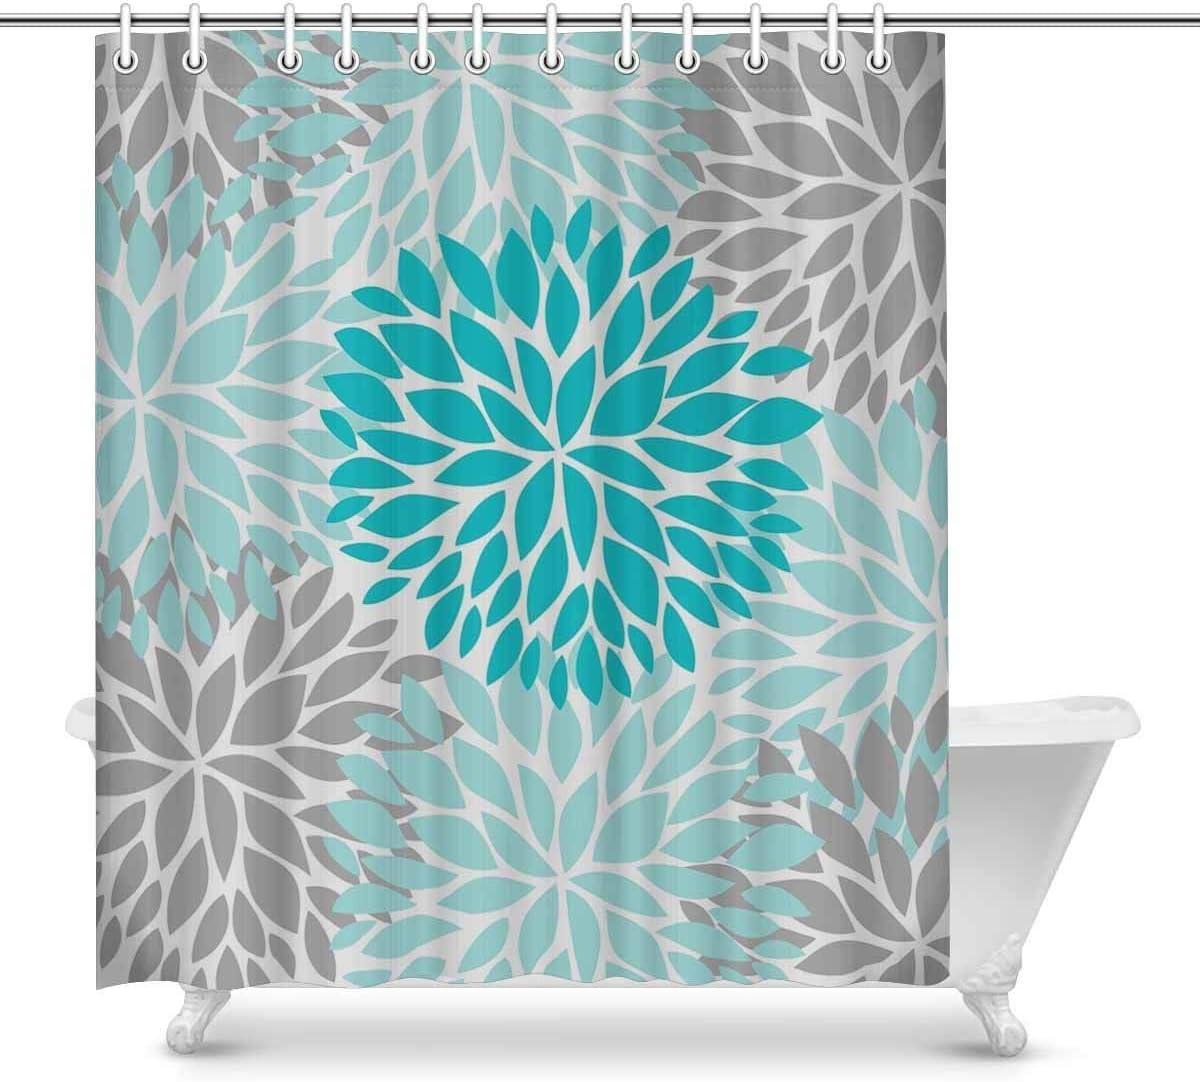 Cloud Dream Home Dahlia Pinnata Flower Turquoise Blue and Gray Shower Curtain,Waterproof Polyester Fabric Bath Curtain Design,36x72-Inch